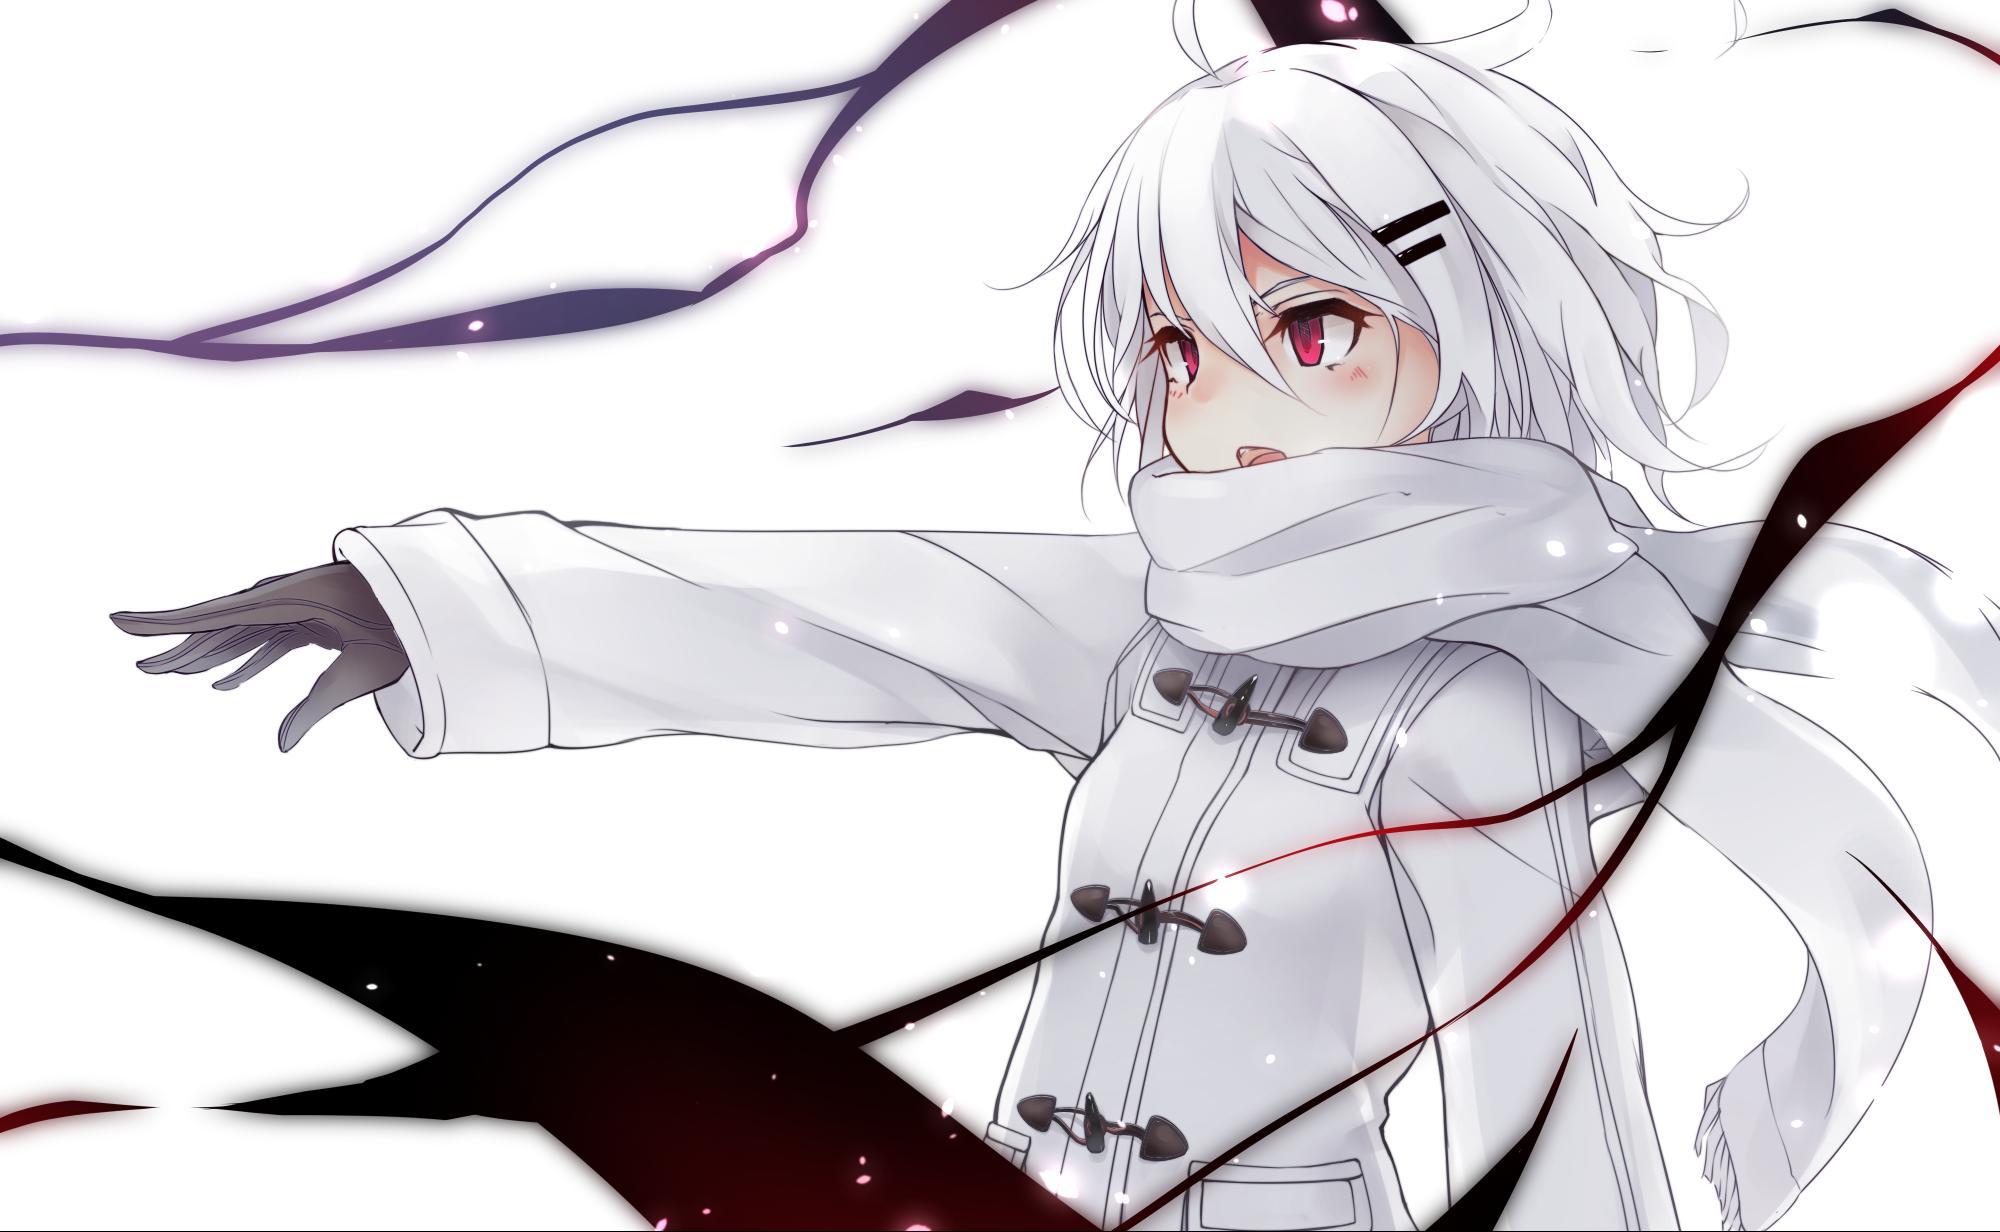 Pretty White Anime Girls Wallpapers ...